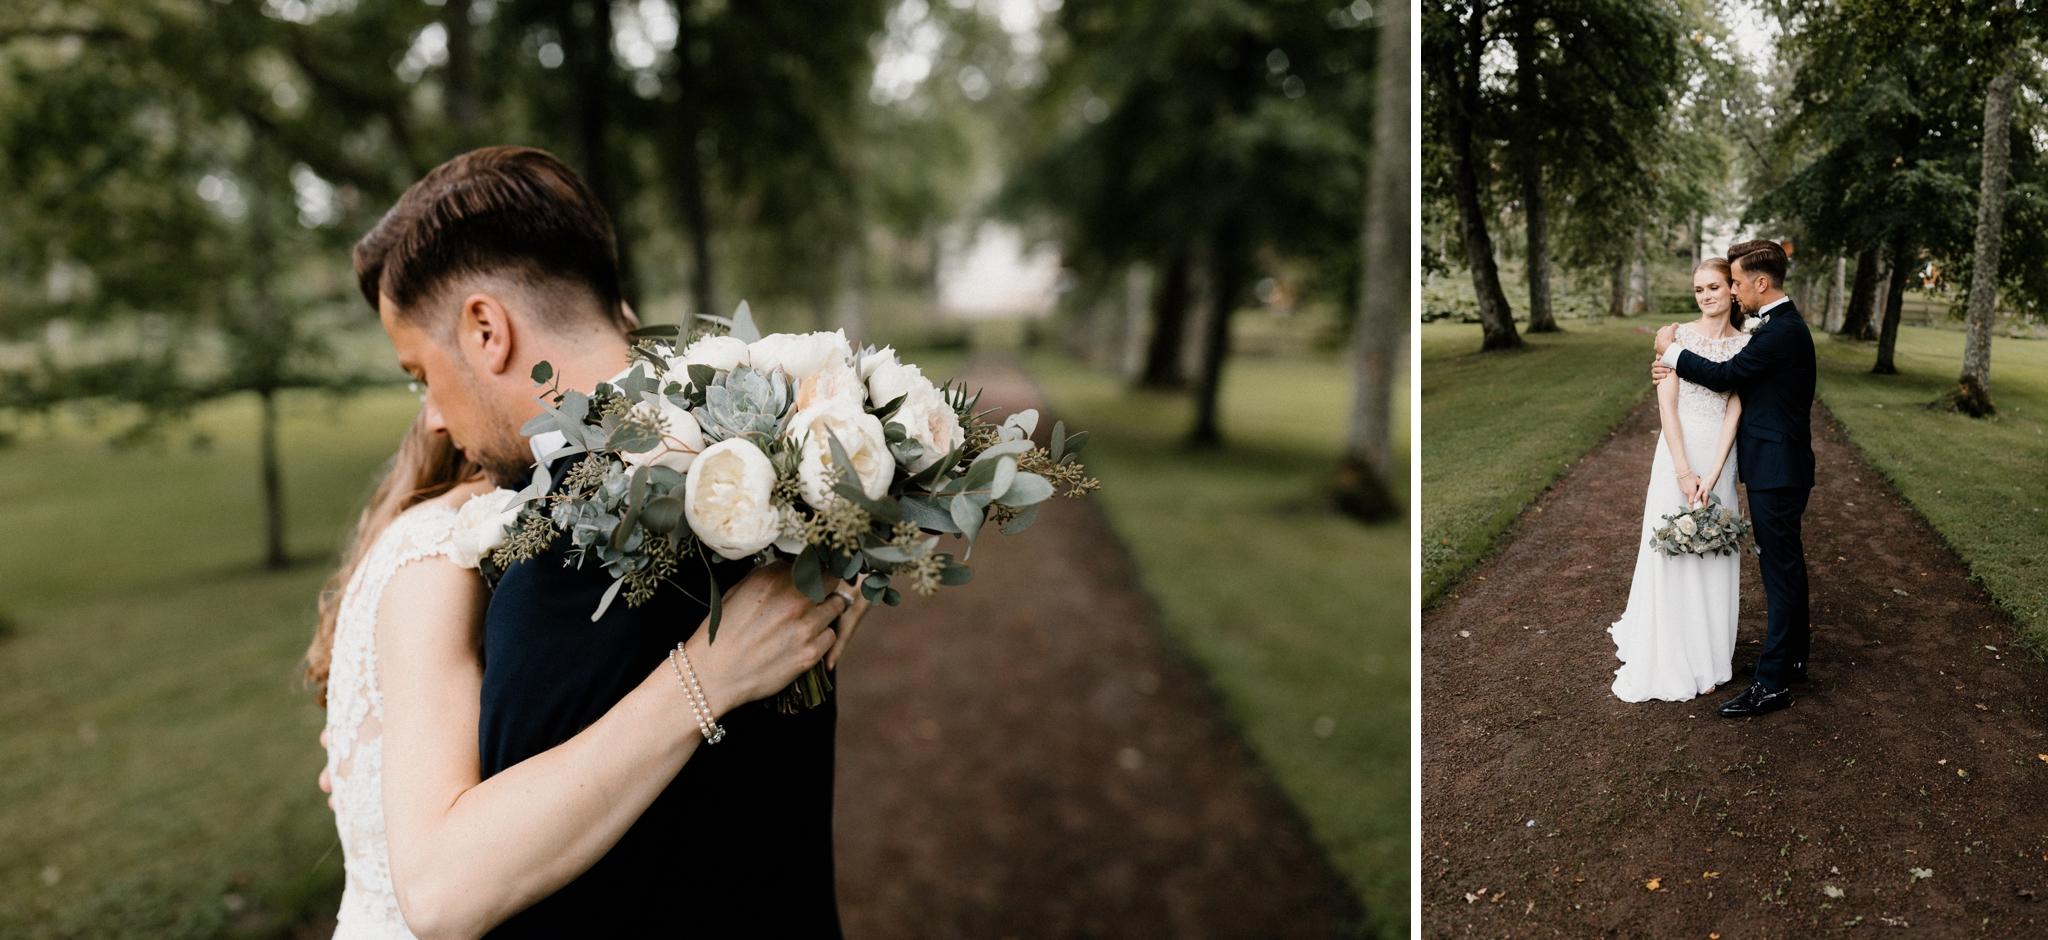 Jessica + Patrick | Fagervik | by Patrick Karkkolainen Wedding Photography-35.jpg